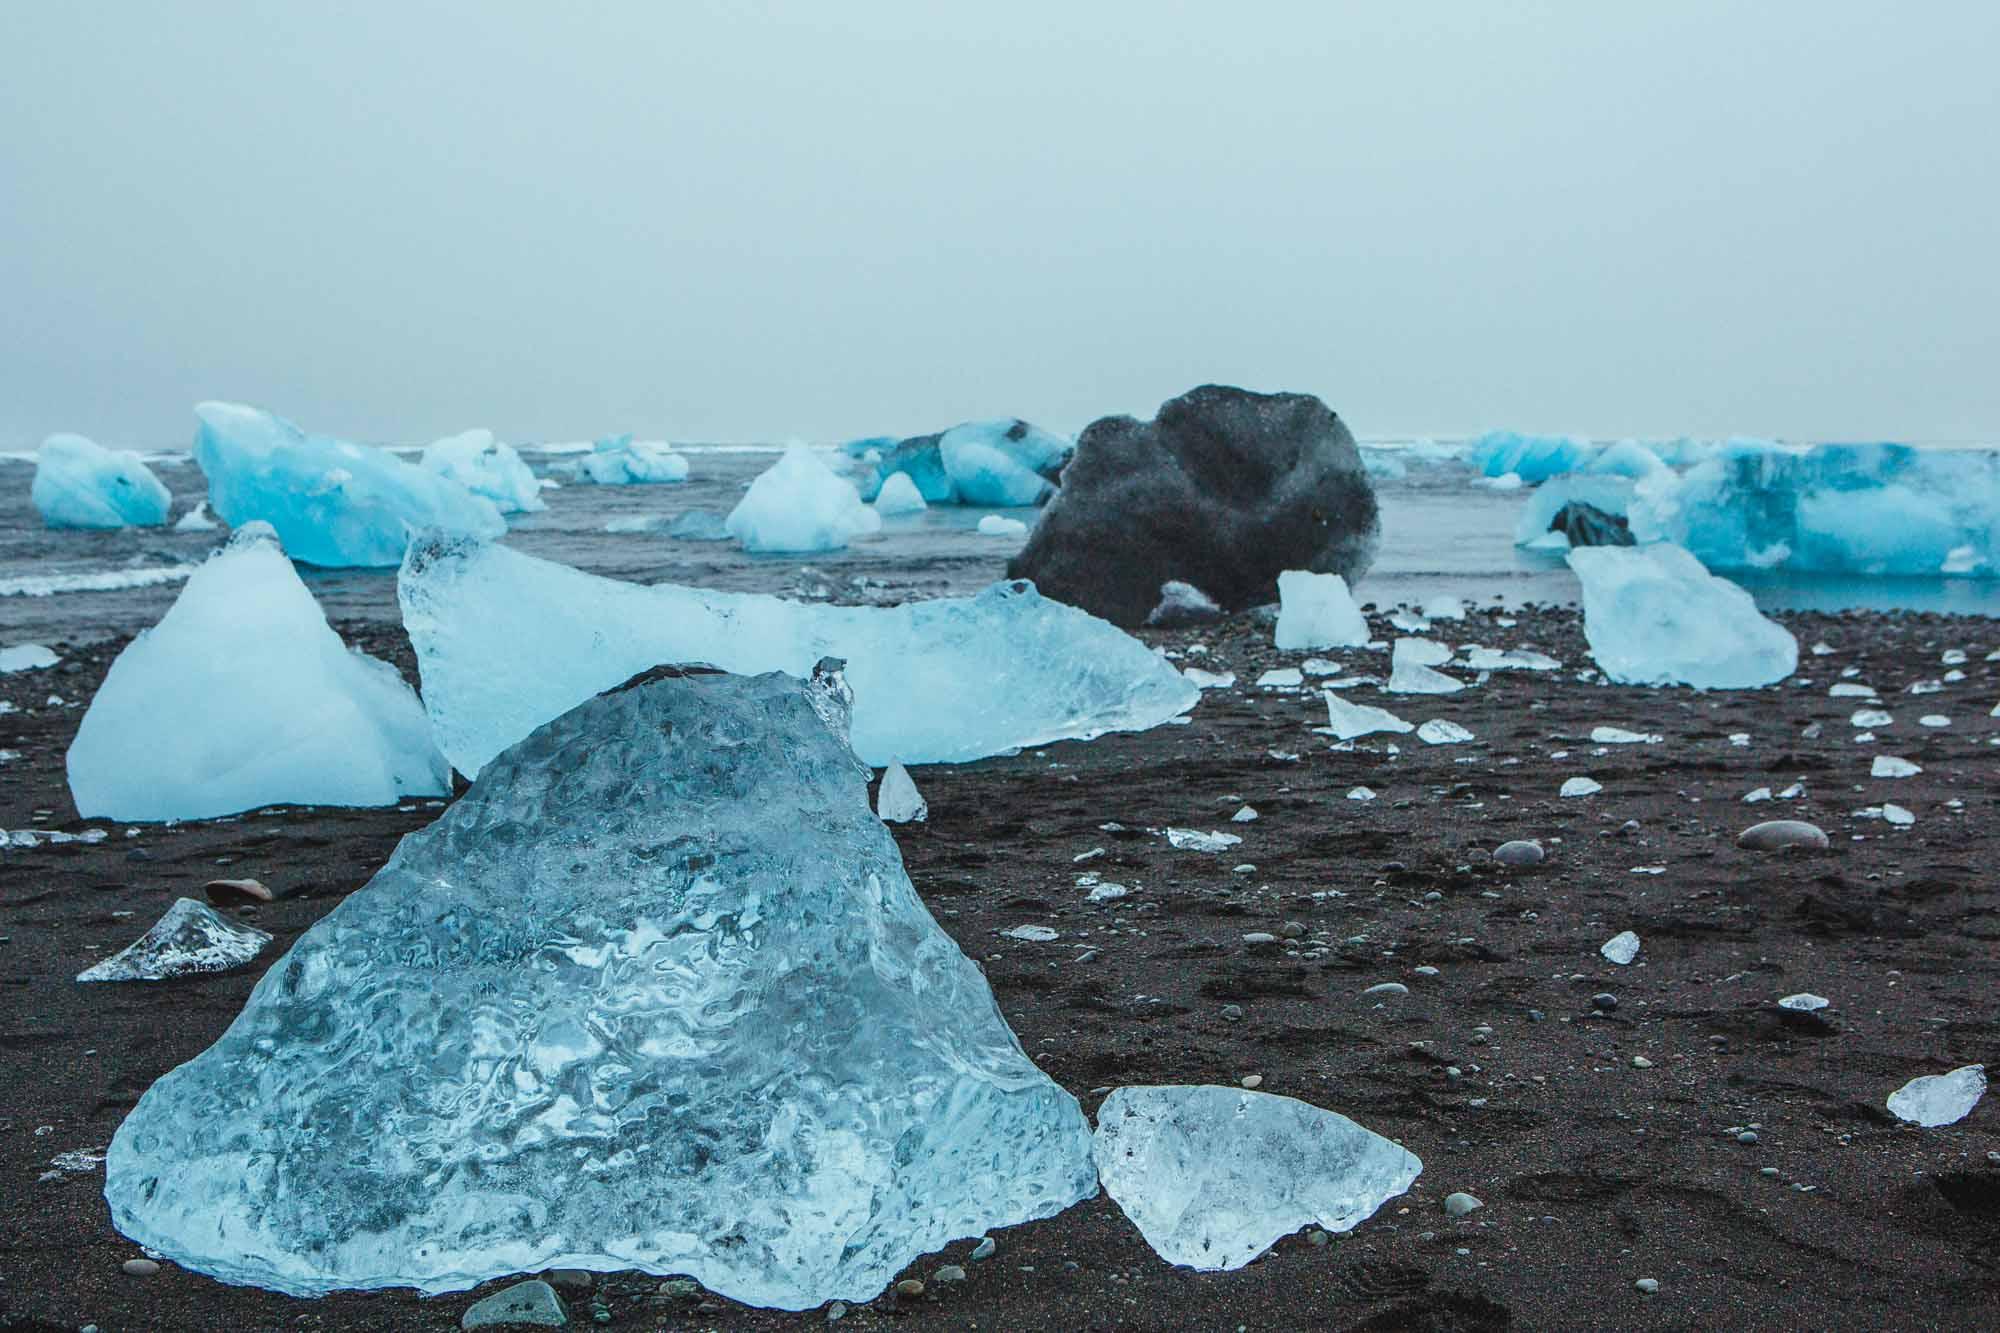 Iceland photoIceland photo inspiration – Jokulsarlon Diamond Beach